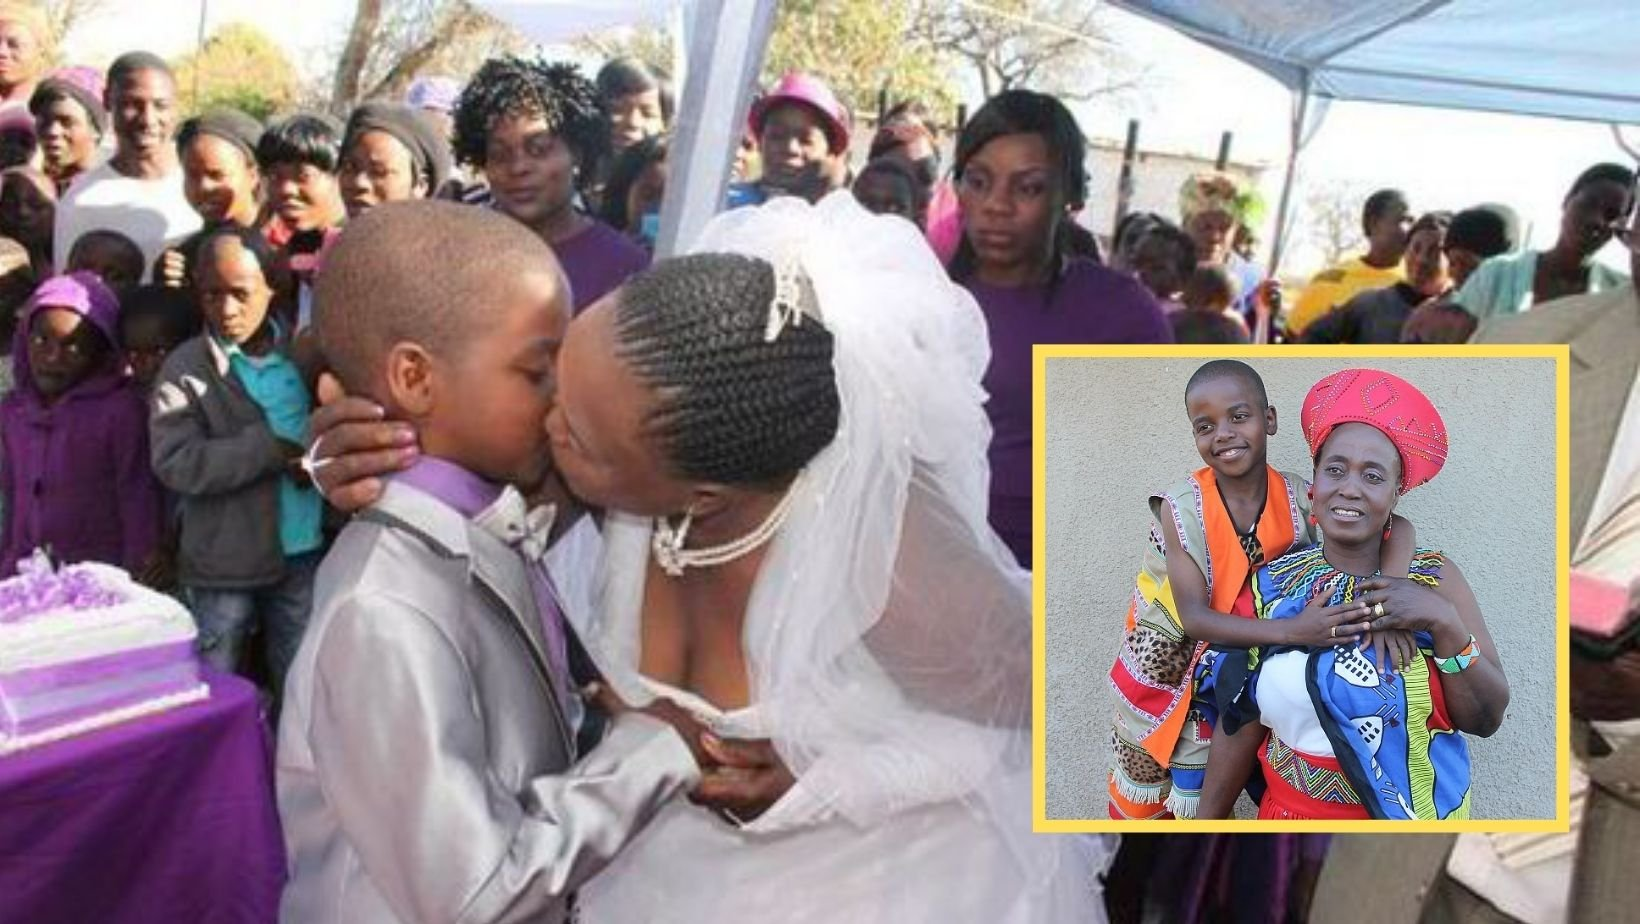 1 116.jpg?resize=1200,630 - Woman, 62, Marries Boy, 9, In A 'Sickening' Wedding Ceremony